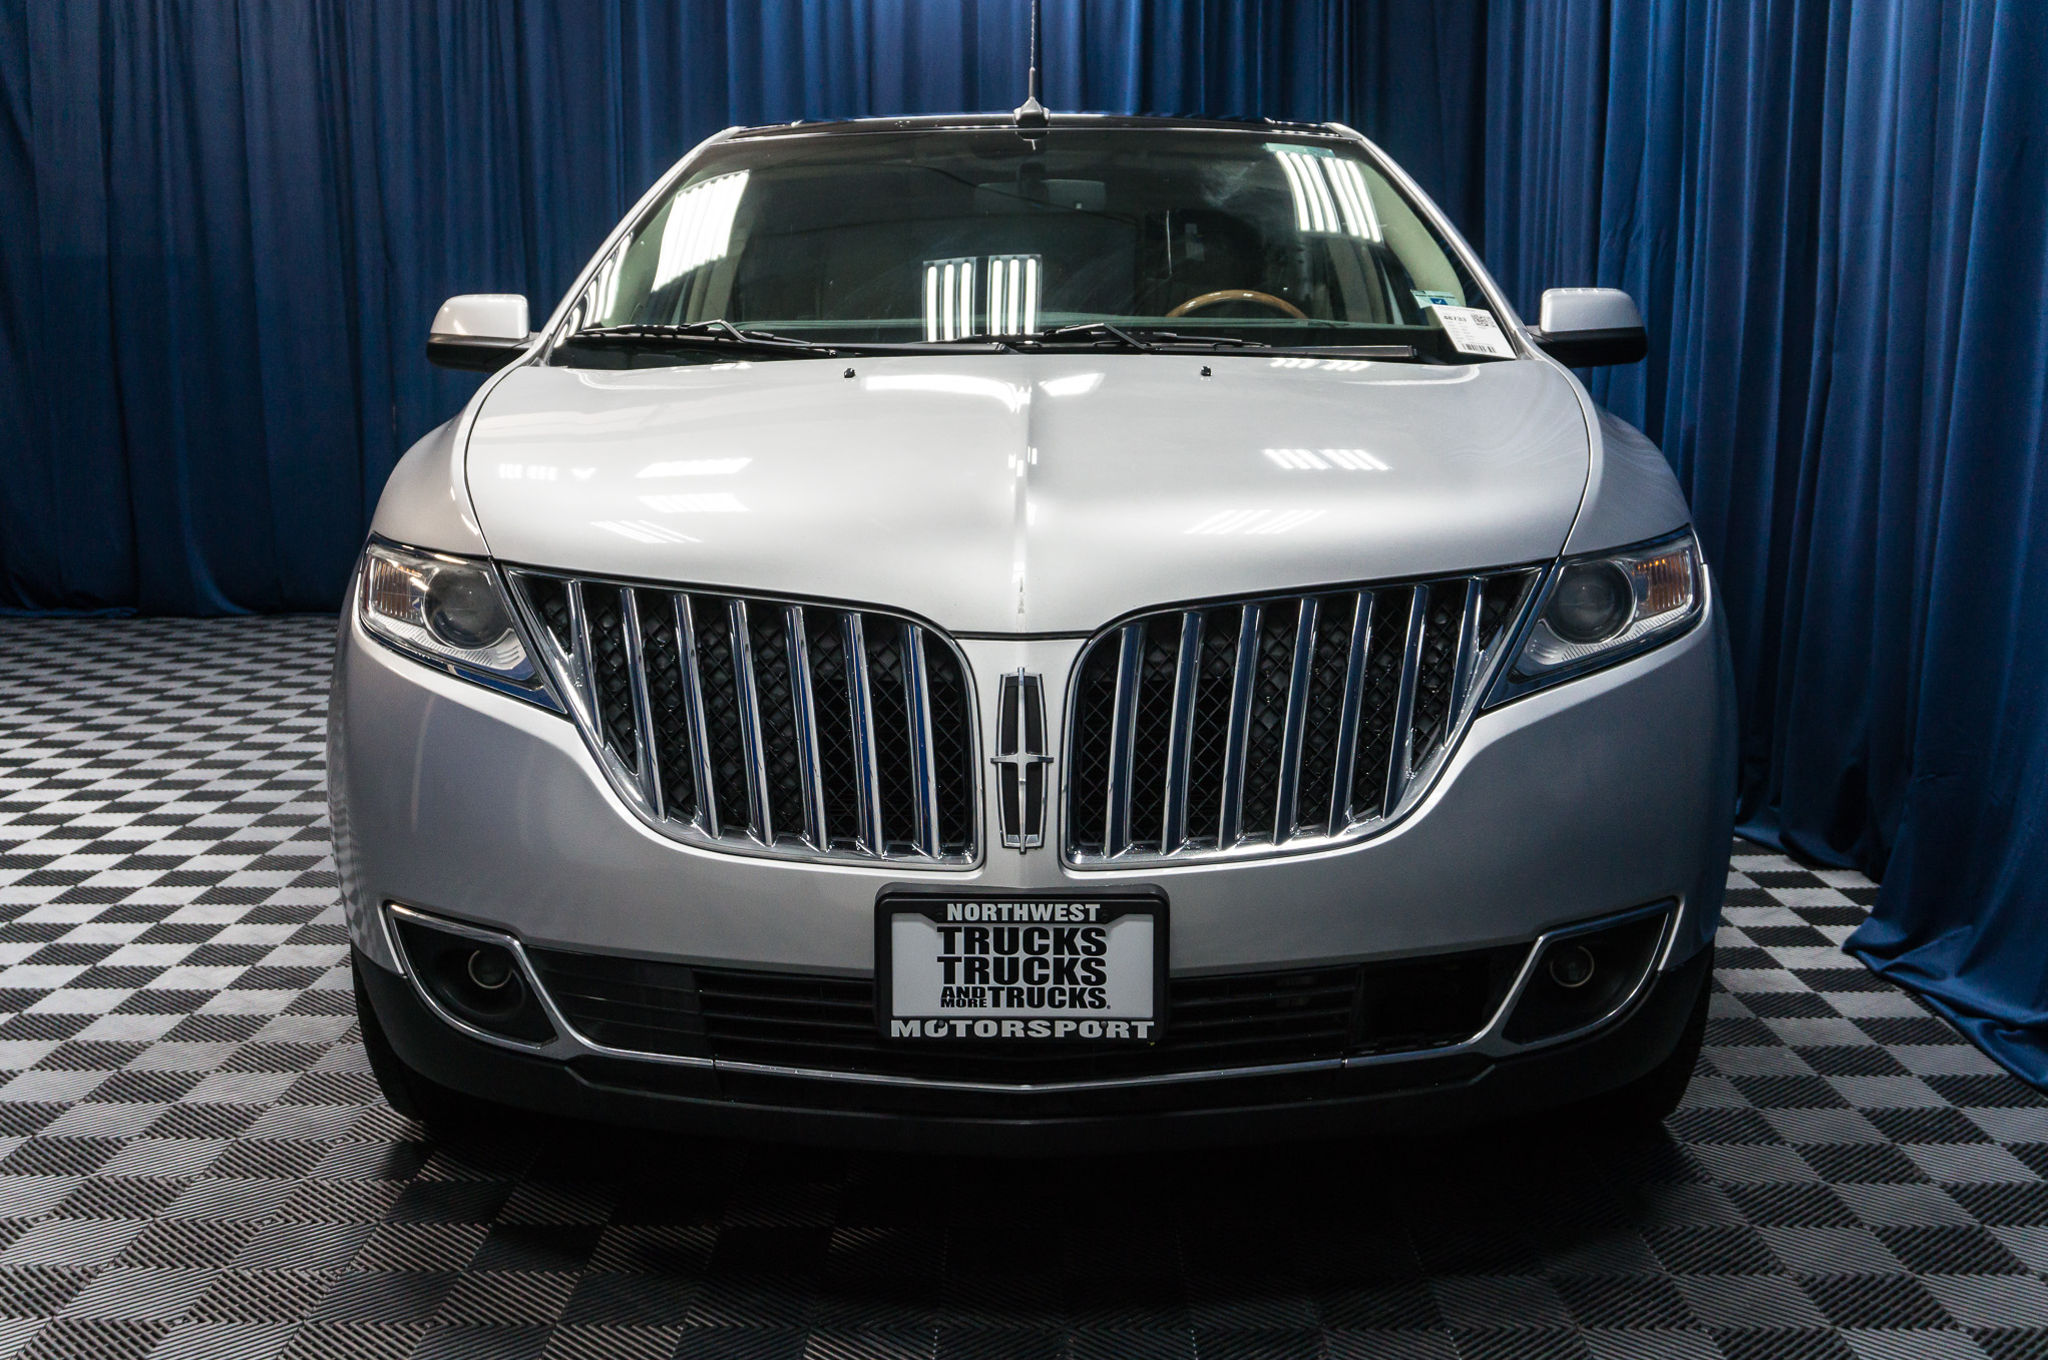 dealer nm used mks car watch farmington youtube lincoln